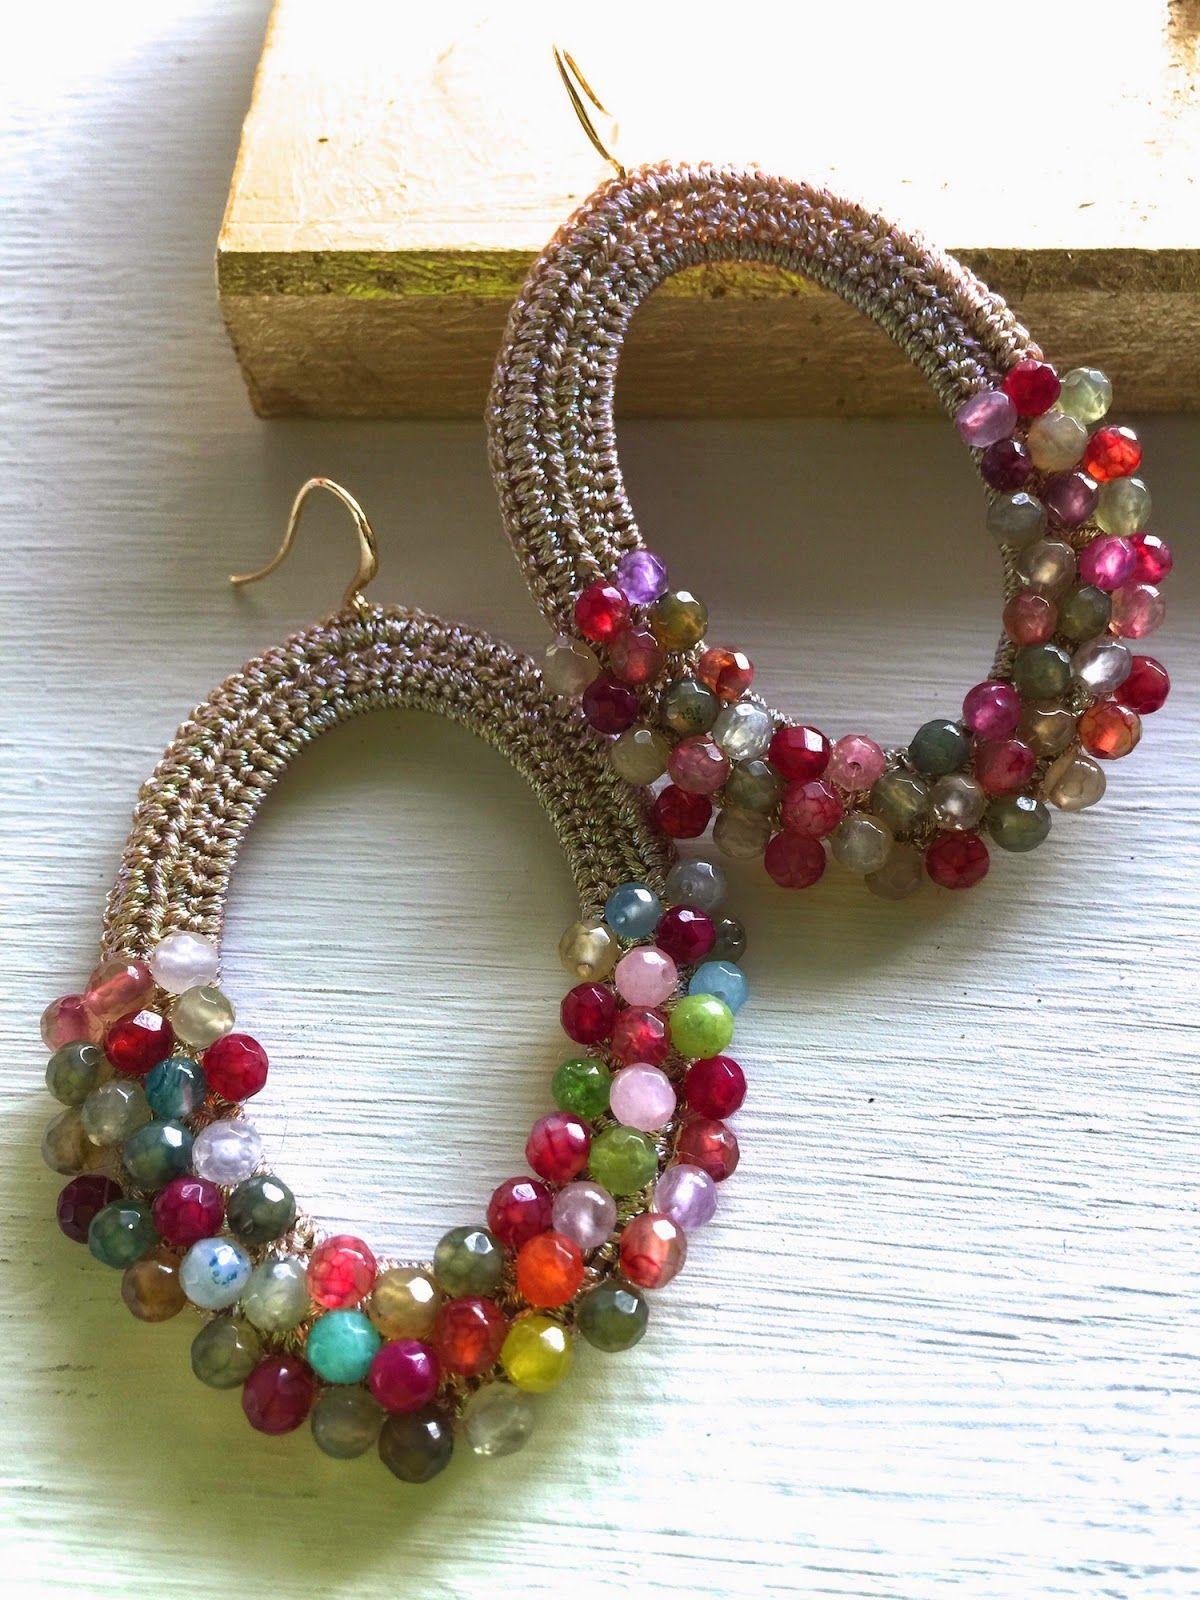 Nuovissimi orecchini in pietre dure multicolori giade for Orecchini con pietre dure fai da te